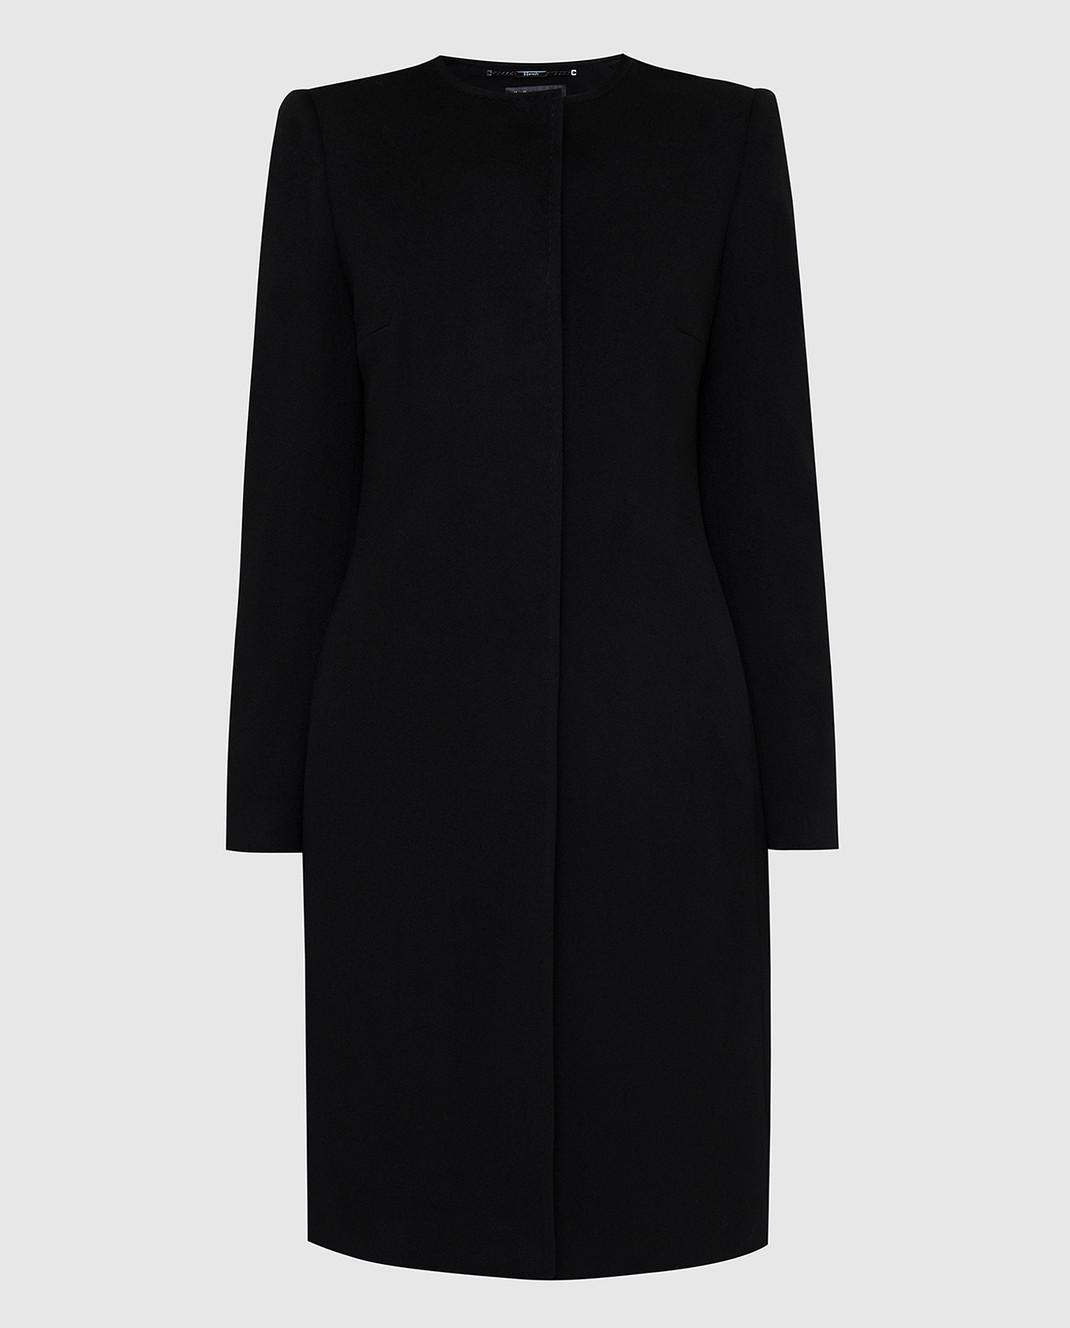 Heresis Черное пальто из шерсти D20M100SLIMG300